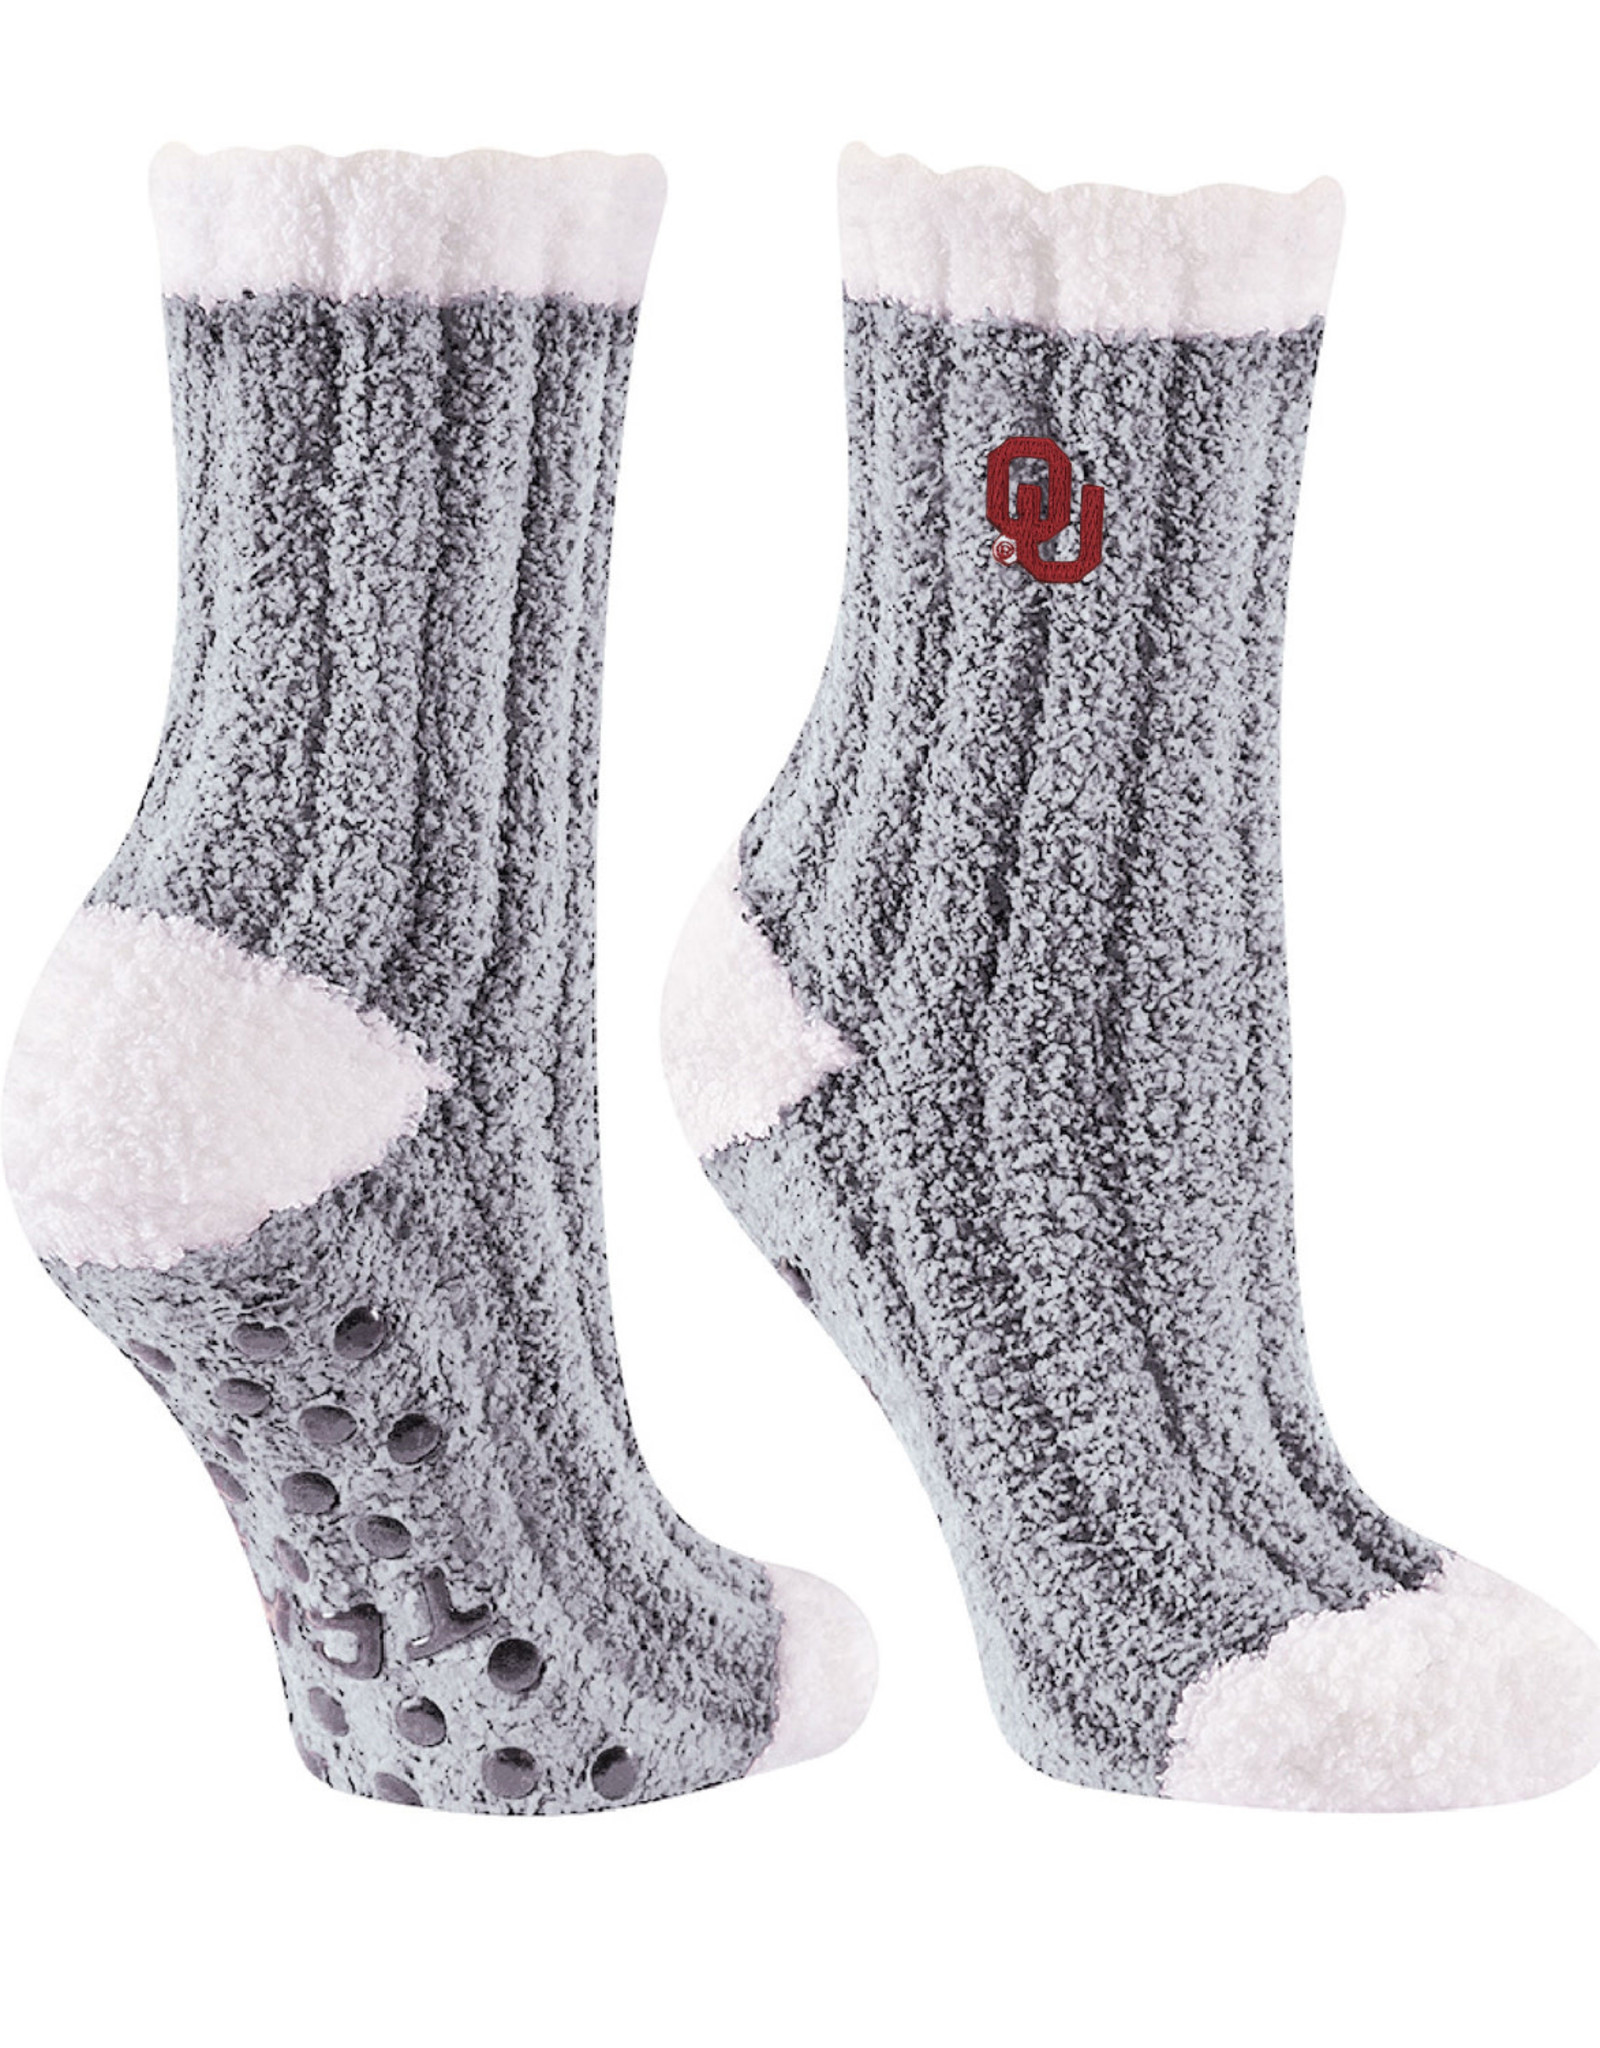 TCK Sherpa Warm Fuzzy w/ Grippers OneSize Fit